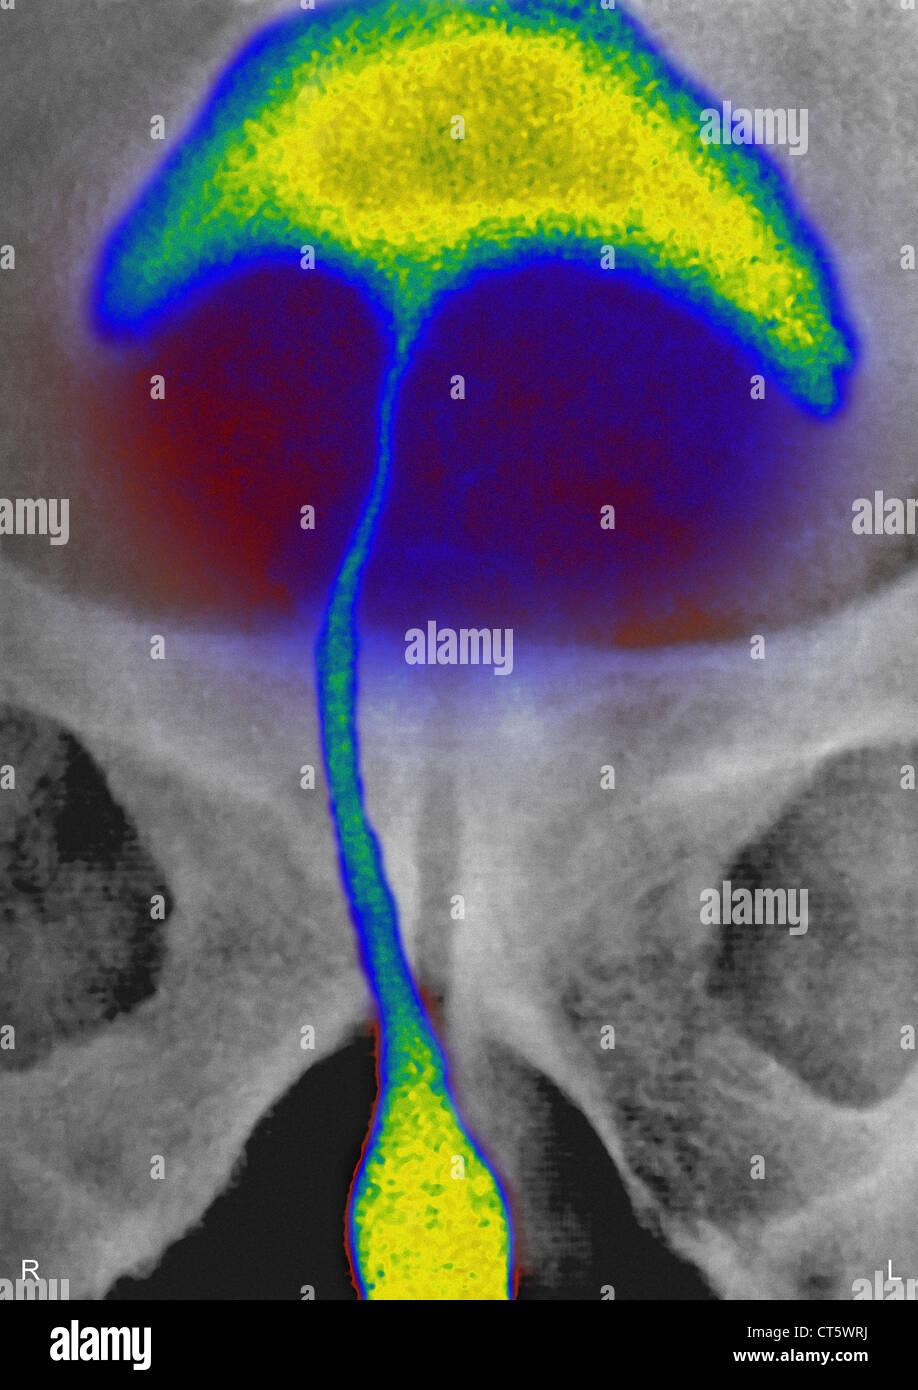 PROSTATIC ADENOMA, X-RAY - Stock Image